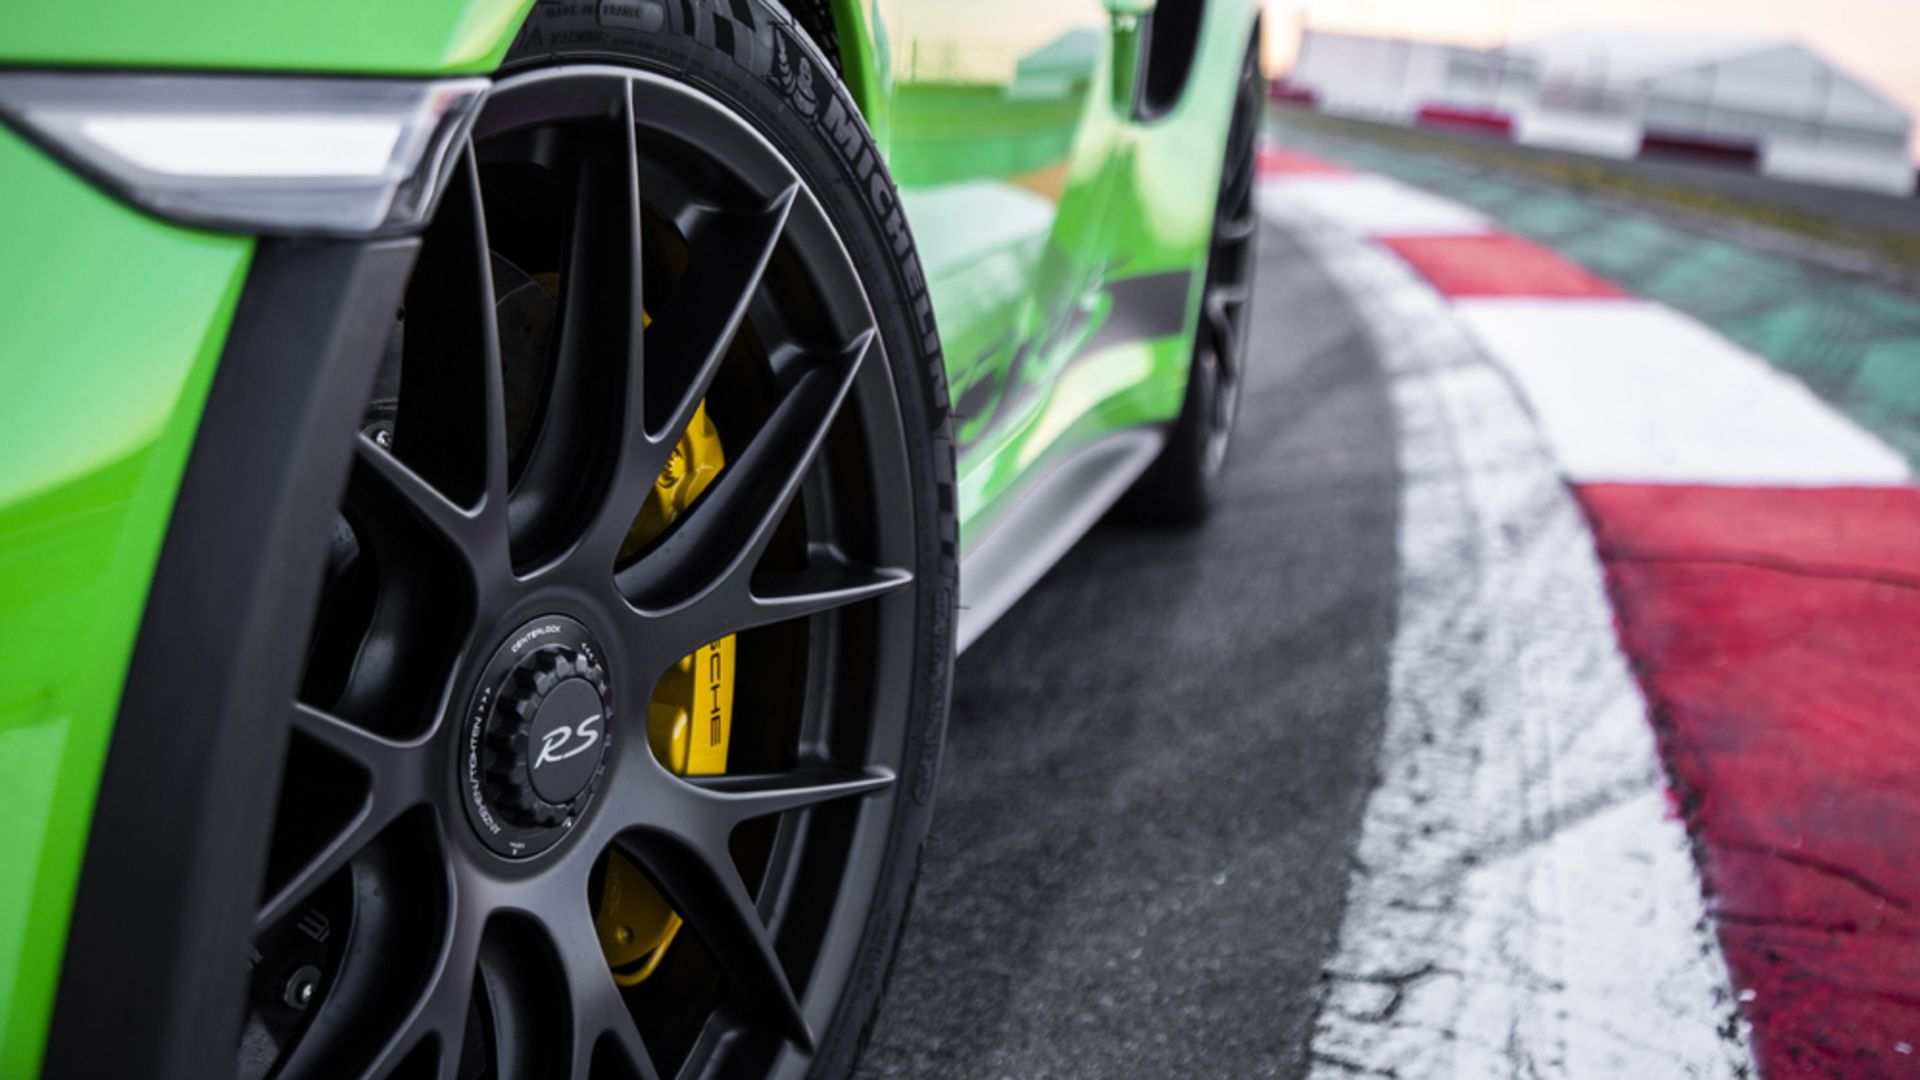 The secrets of car polishing – tip 3